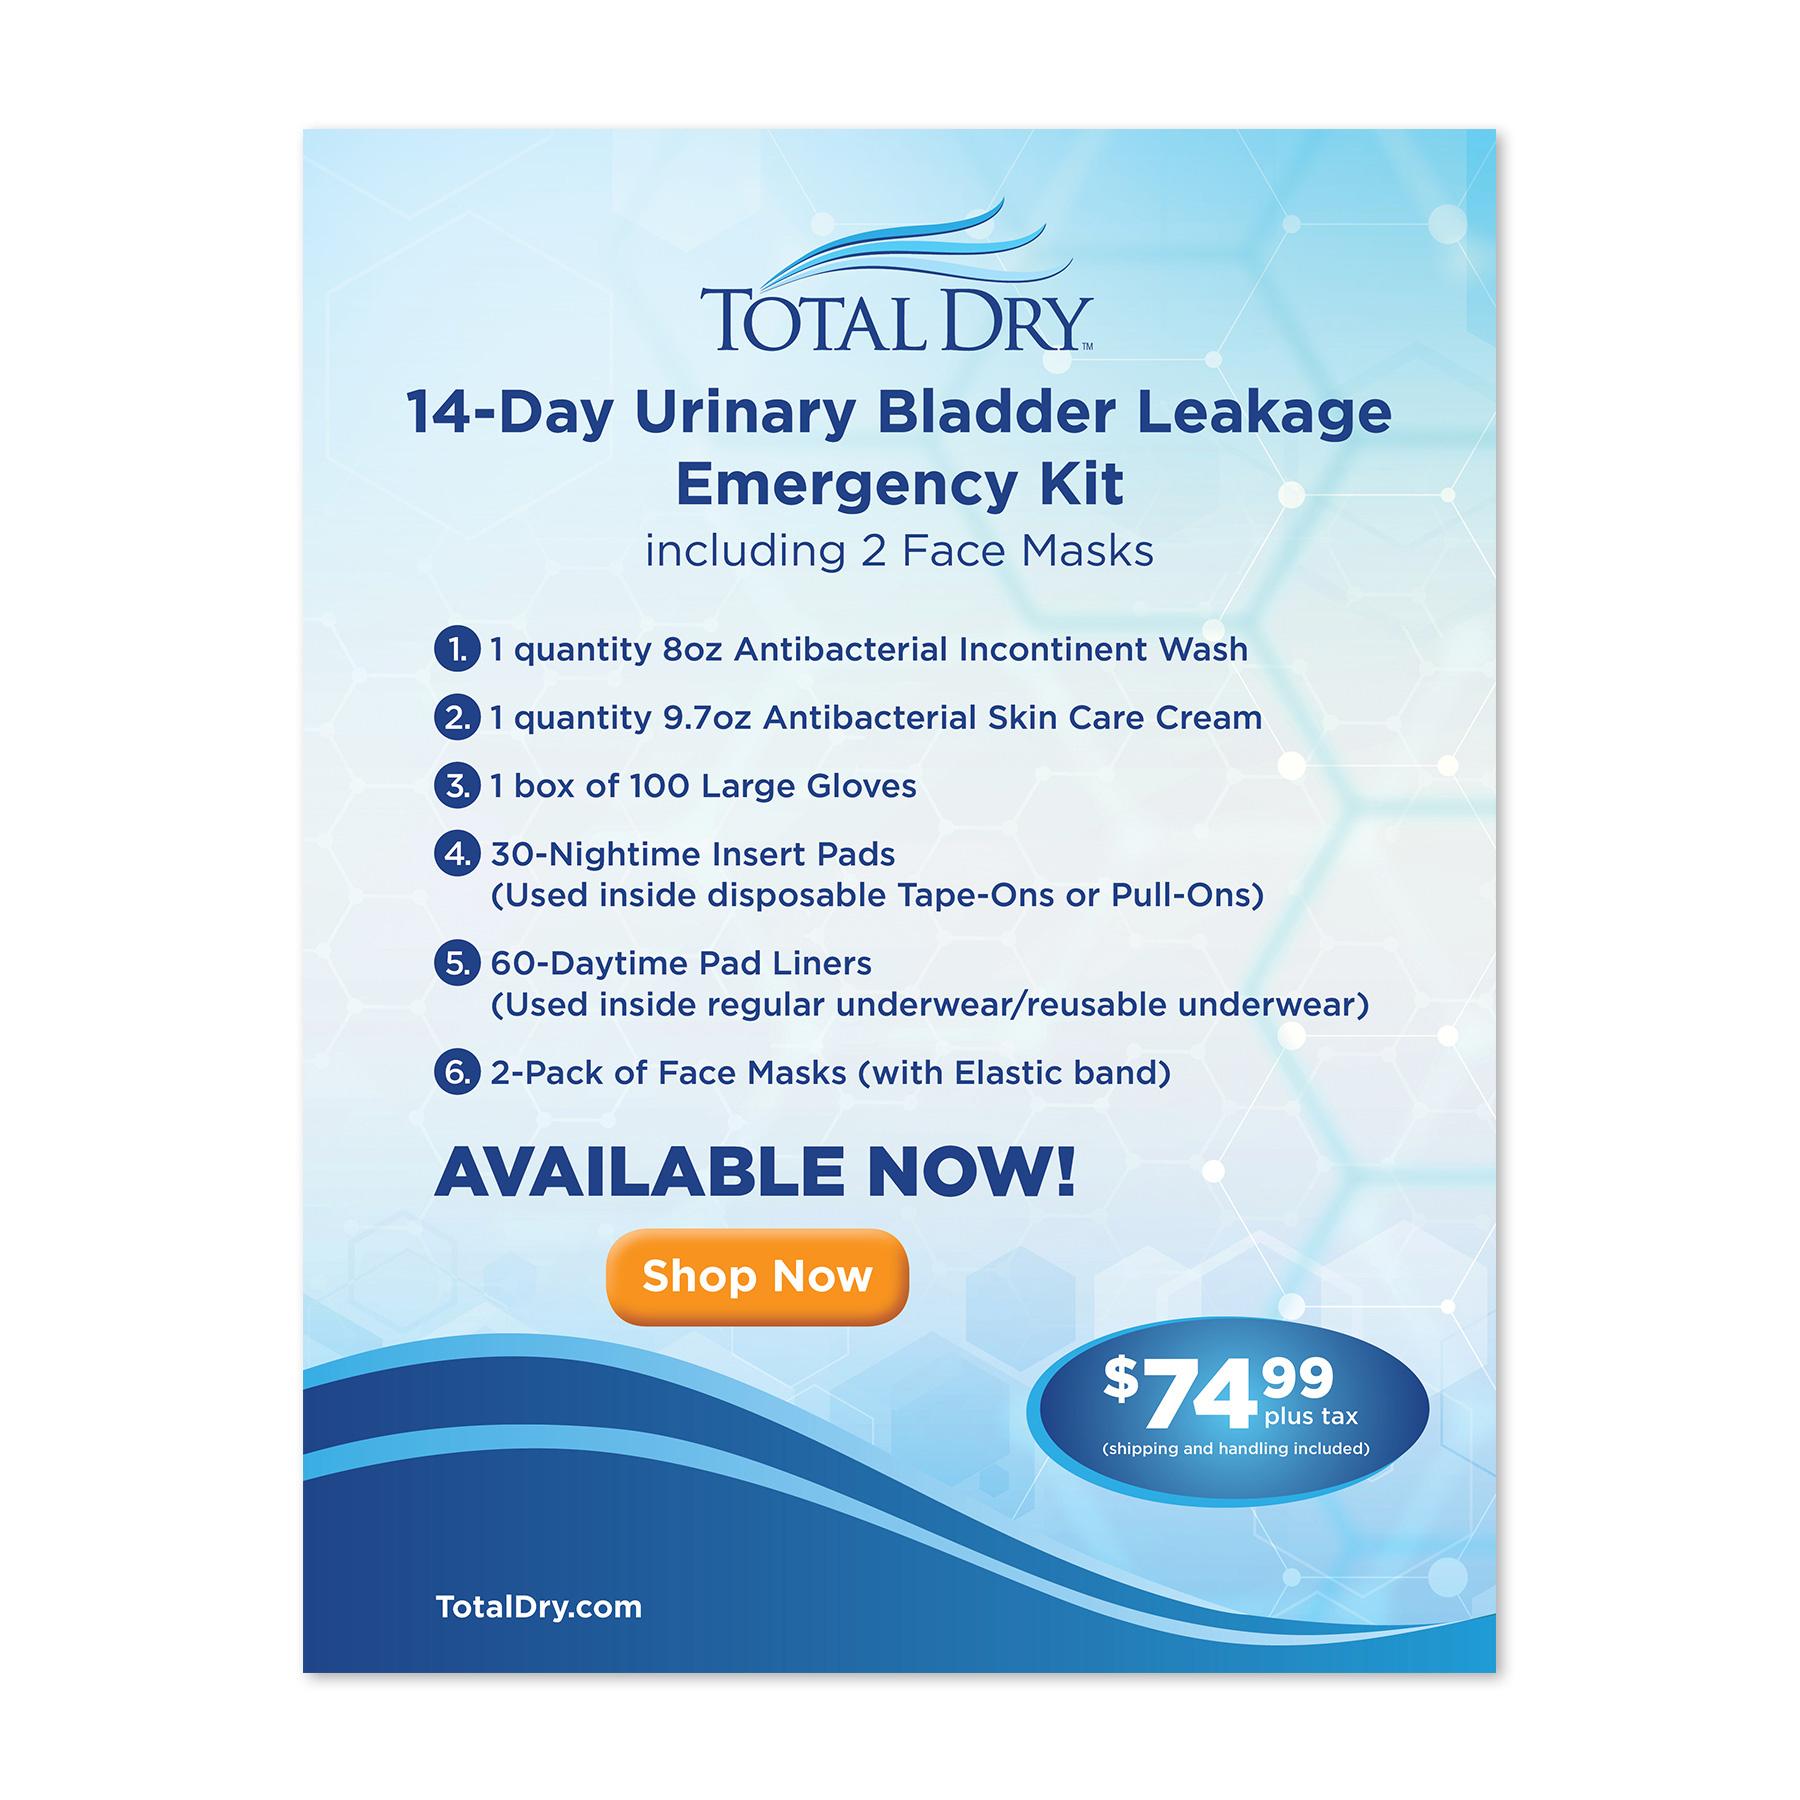 Total Dry Emergency Kit Sell Sheet